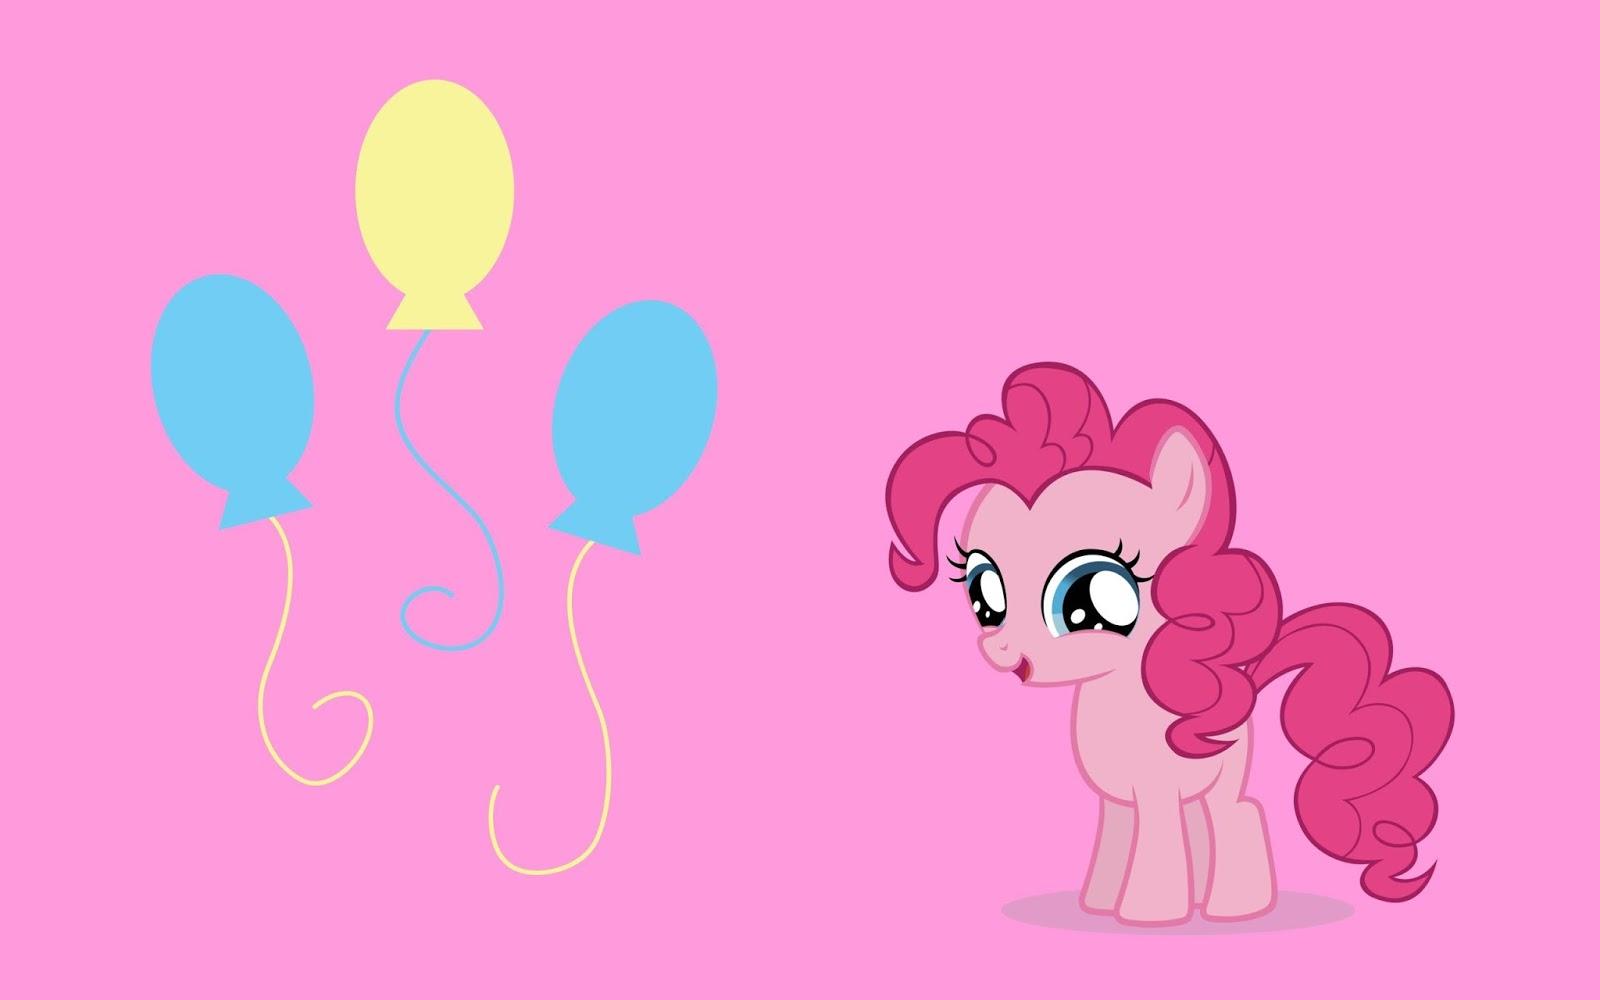 42 Animated My Little Pony Wallpaper On Wallpapersafari